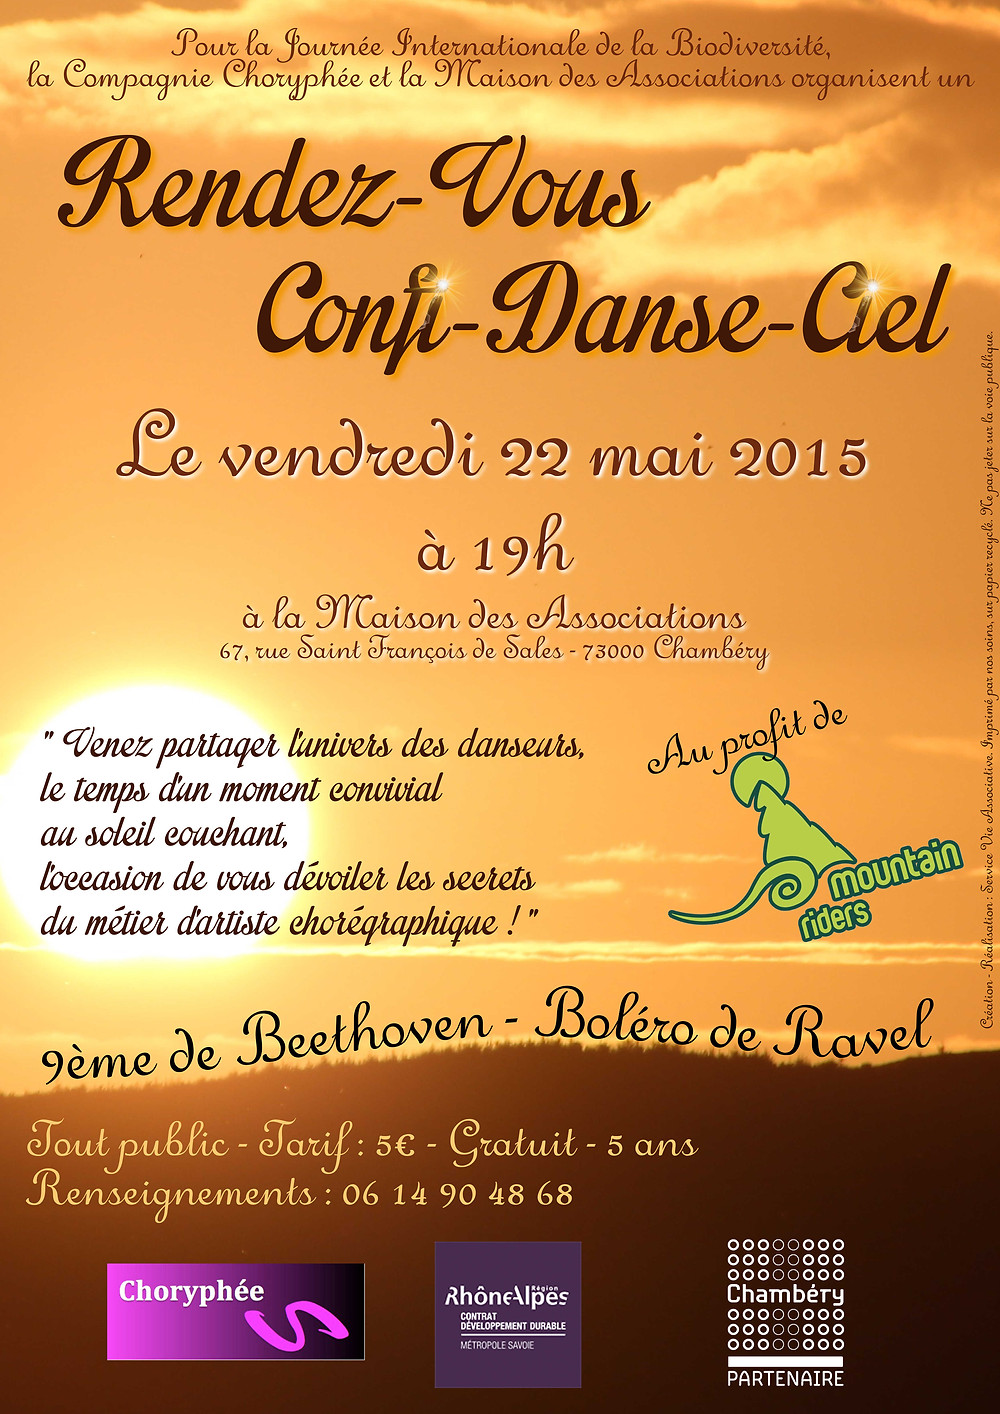 Affiche RDV Confi-Danse-Ciel 2.0.jpg